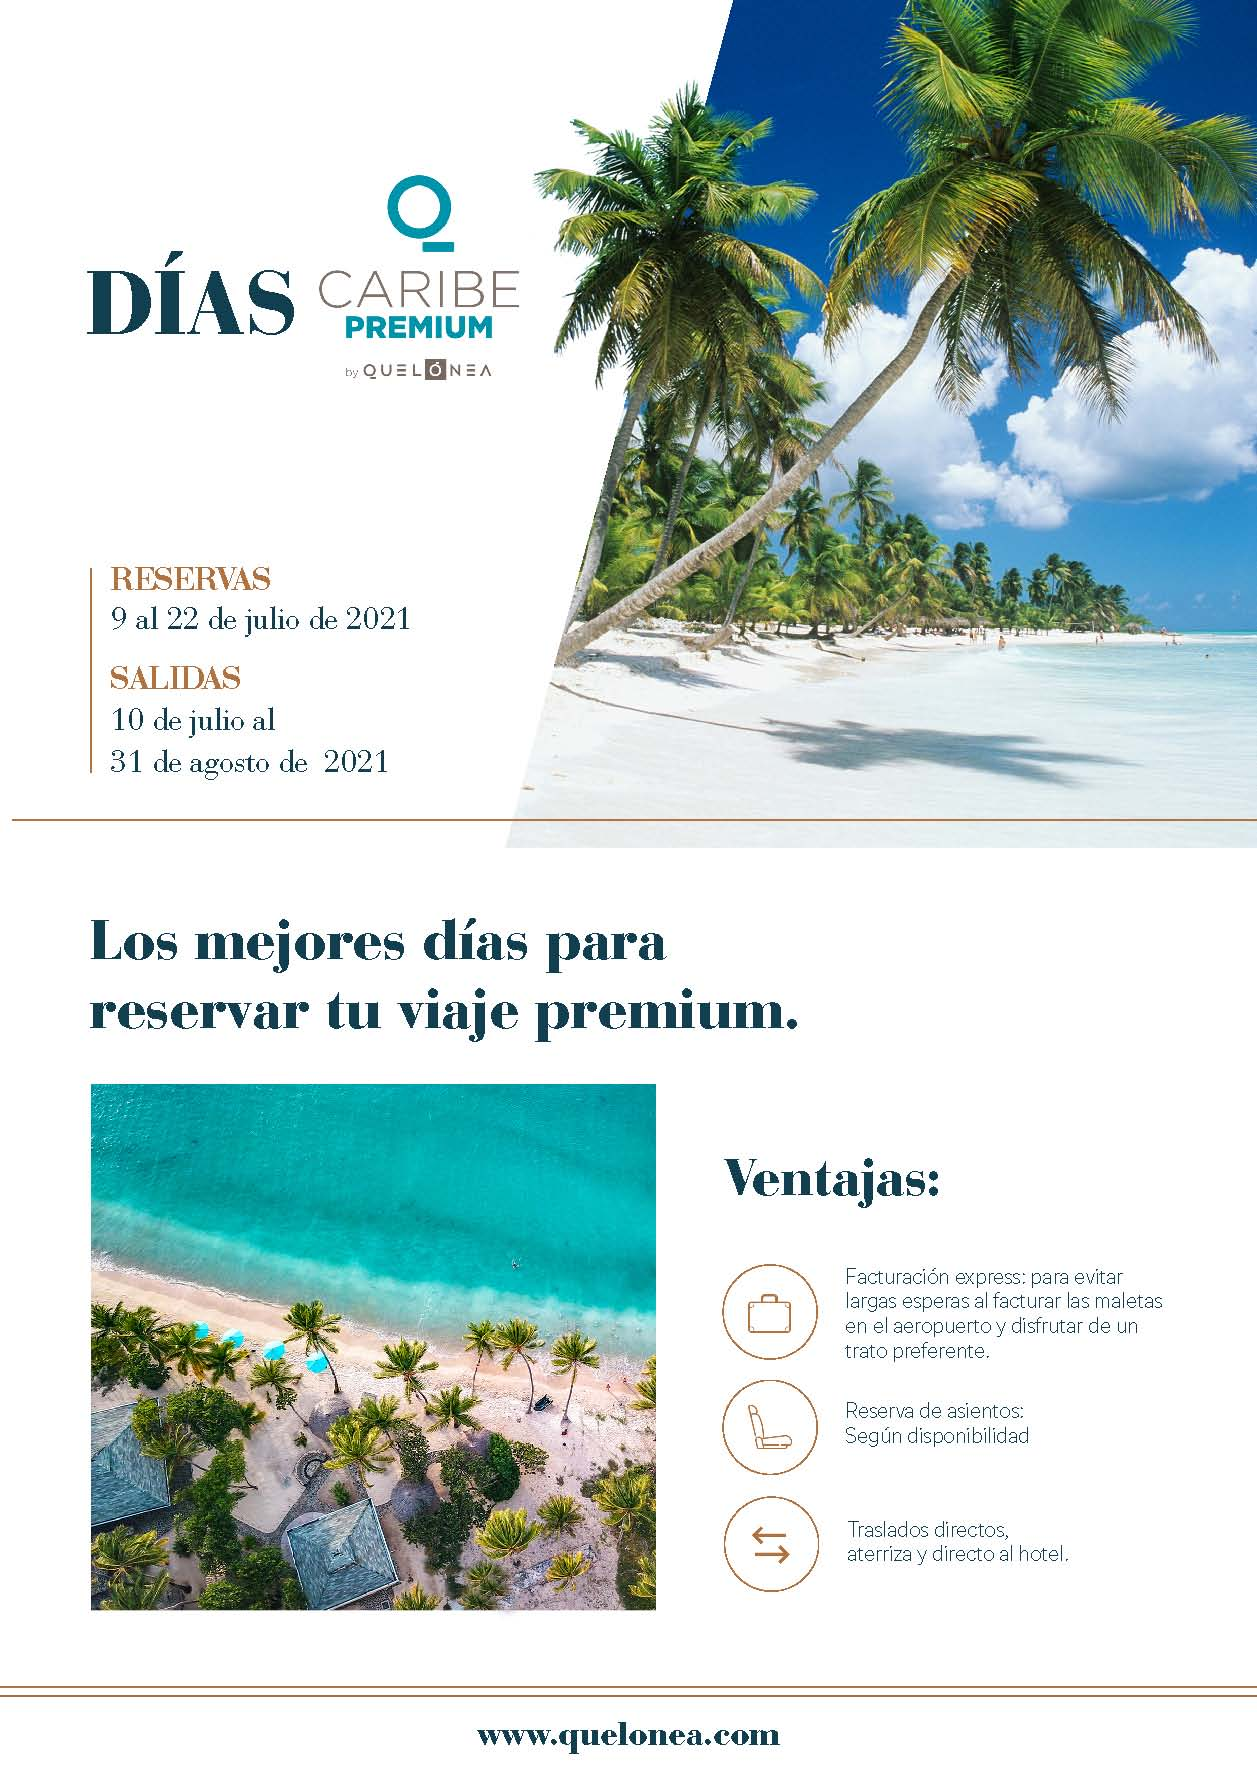 Ofertas Quelonea Dias Caribe Premium Julio Agosto 2021 vuelo directo desde Madrid